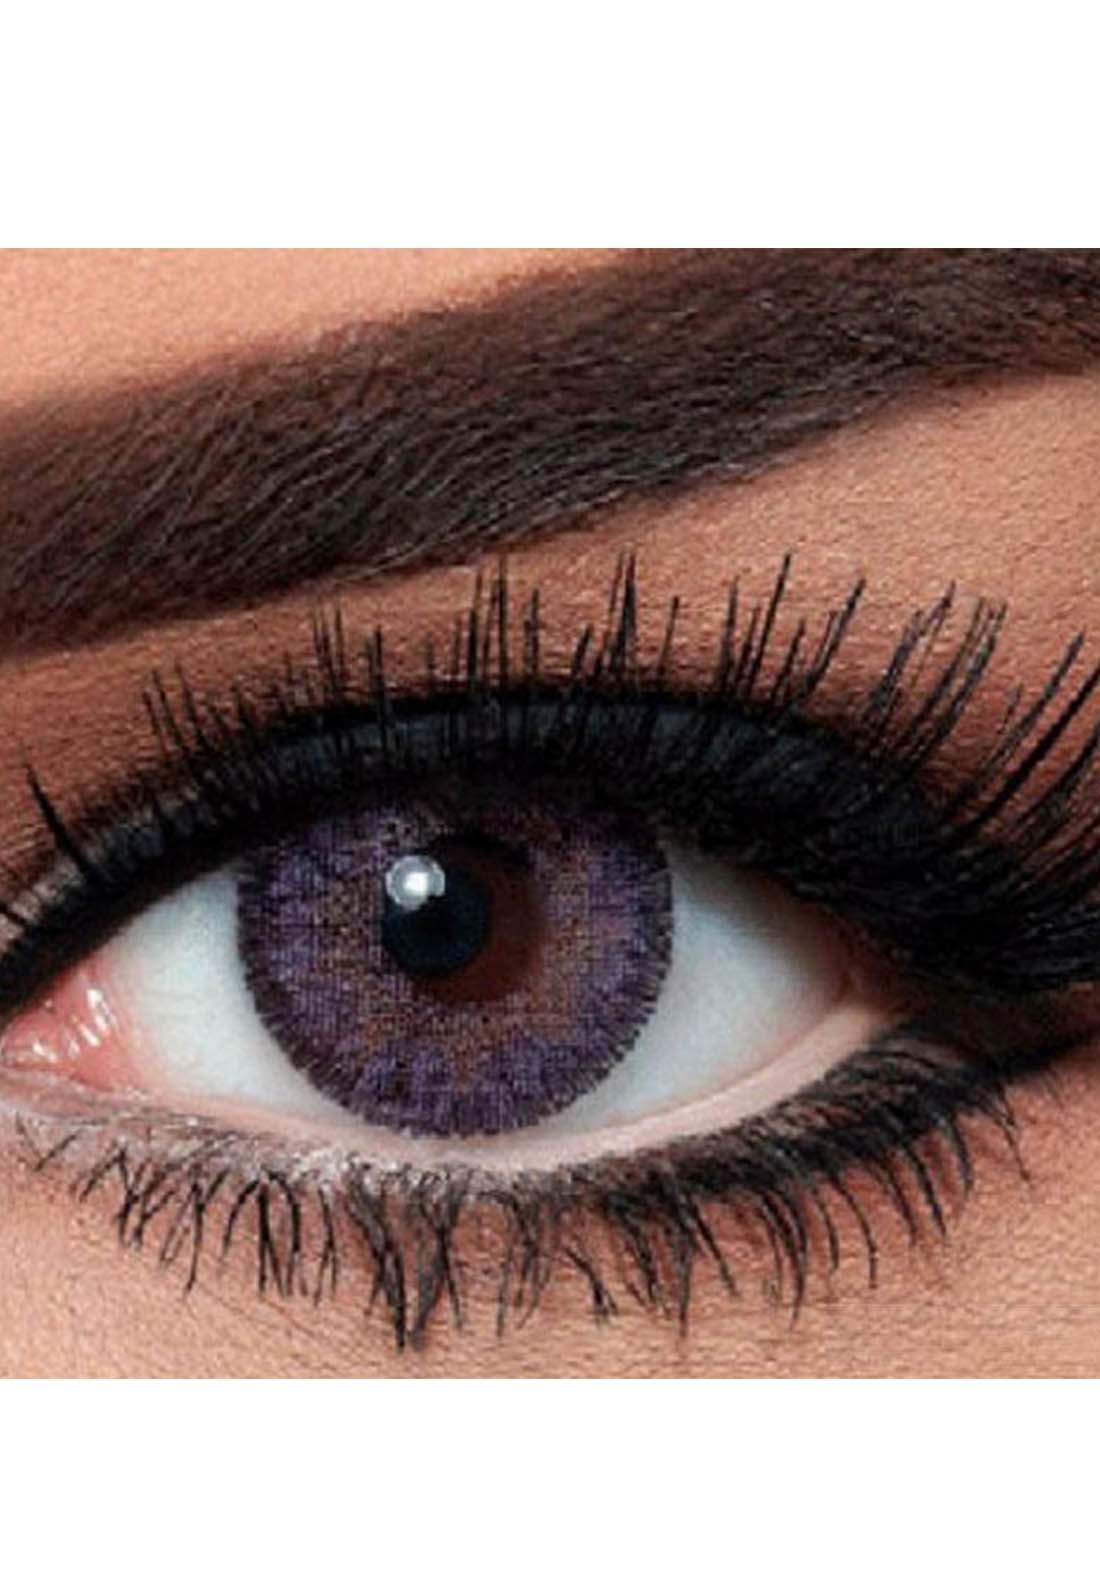 Bella Classic 301002 Contact Lenses 3 Months Use Contour - Violet  No.2 عدسات لاصقة